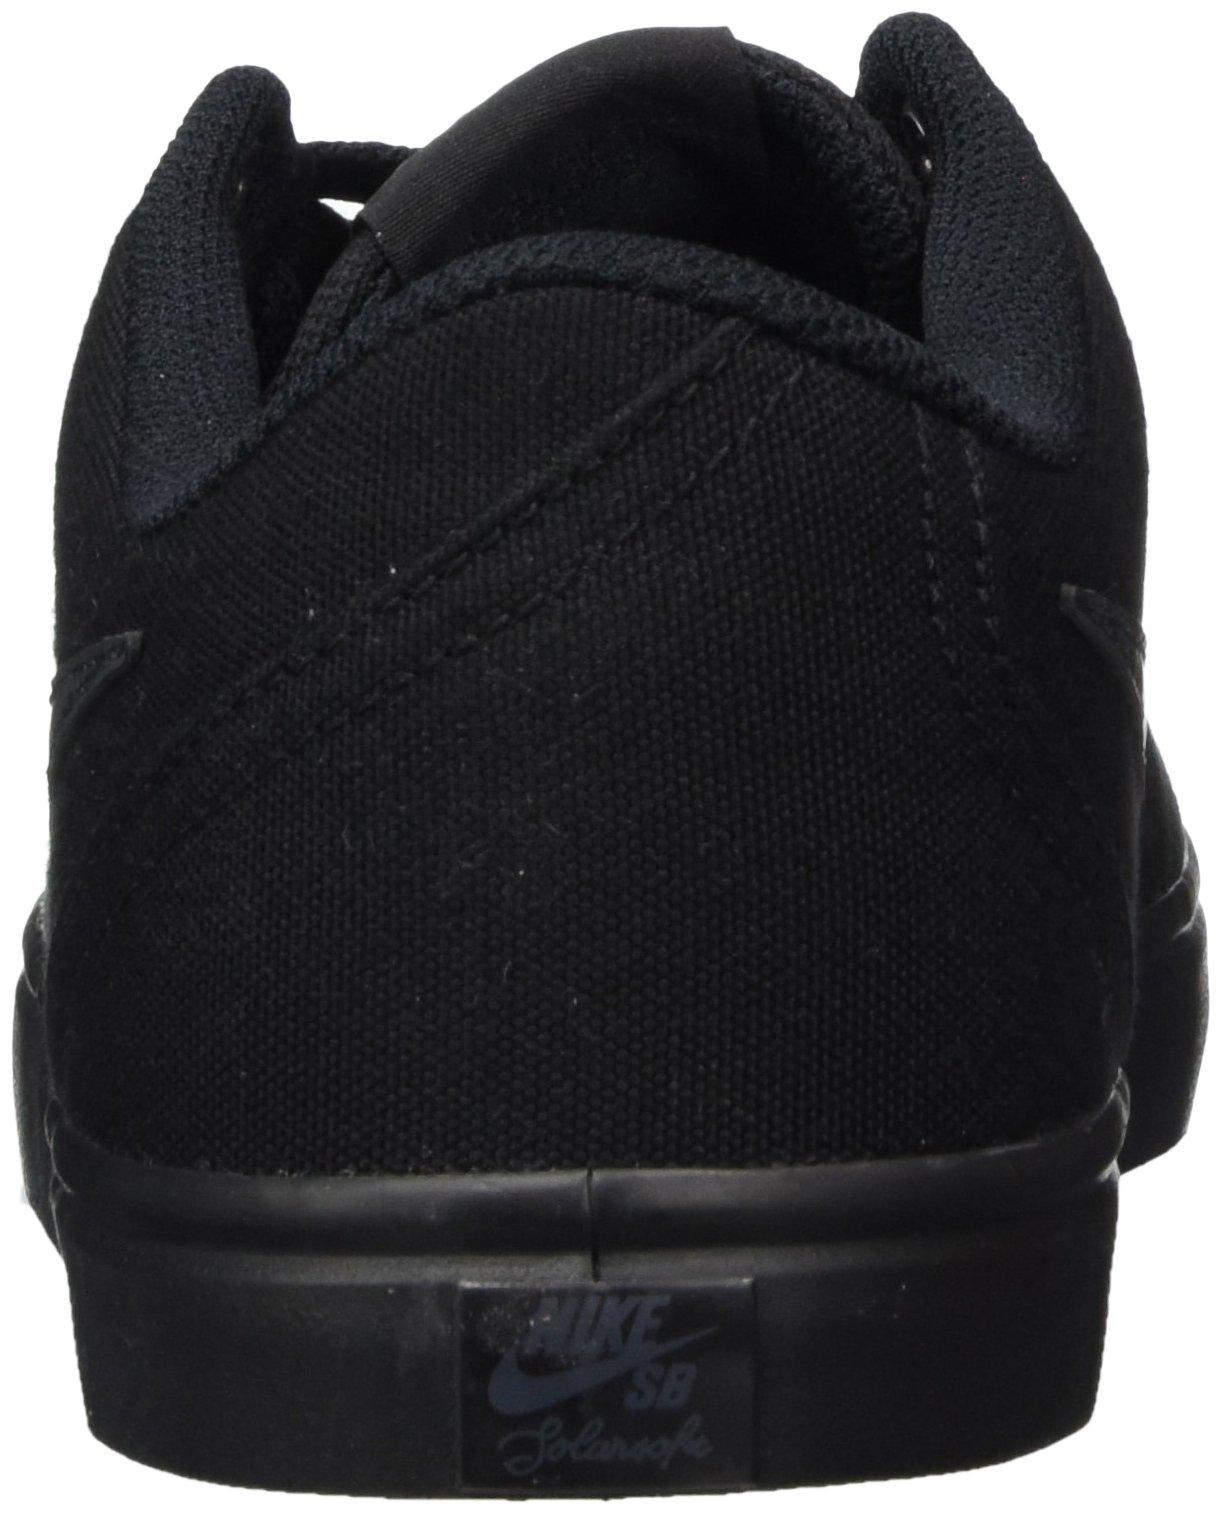 Nike Unisex SB Check Solar CNVS Black/Anthracite Skate Shoe 8.5 Men US / 10 Women US by Nike (Image #2)